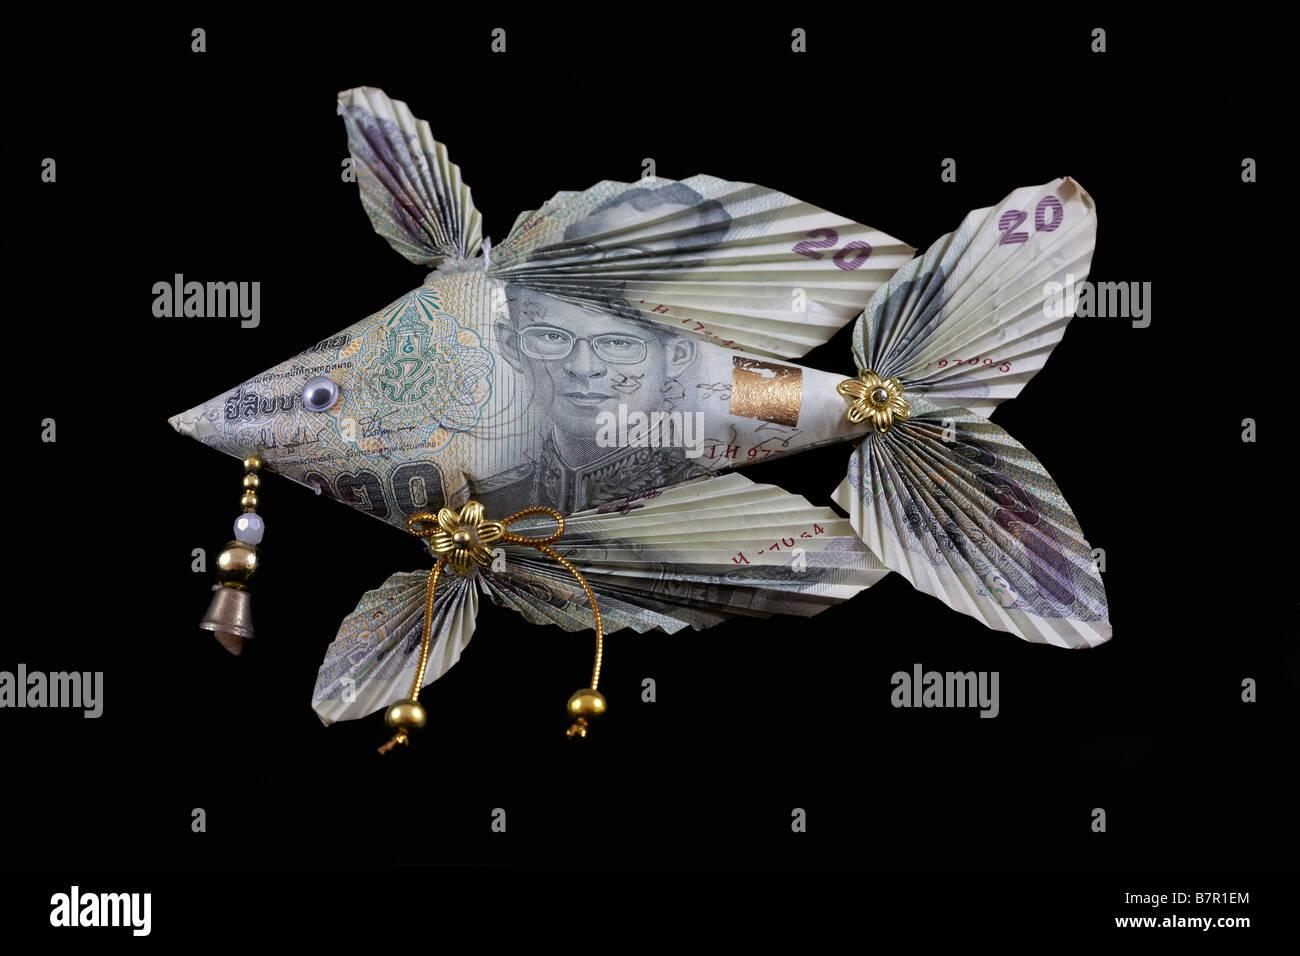 20 Baht Stock Photos & 20 Baht Stock Images - Alamy - photo#29